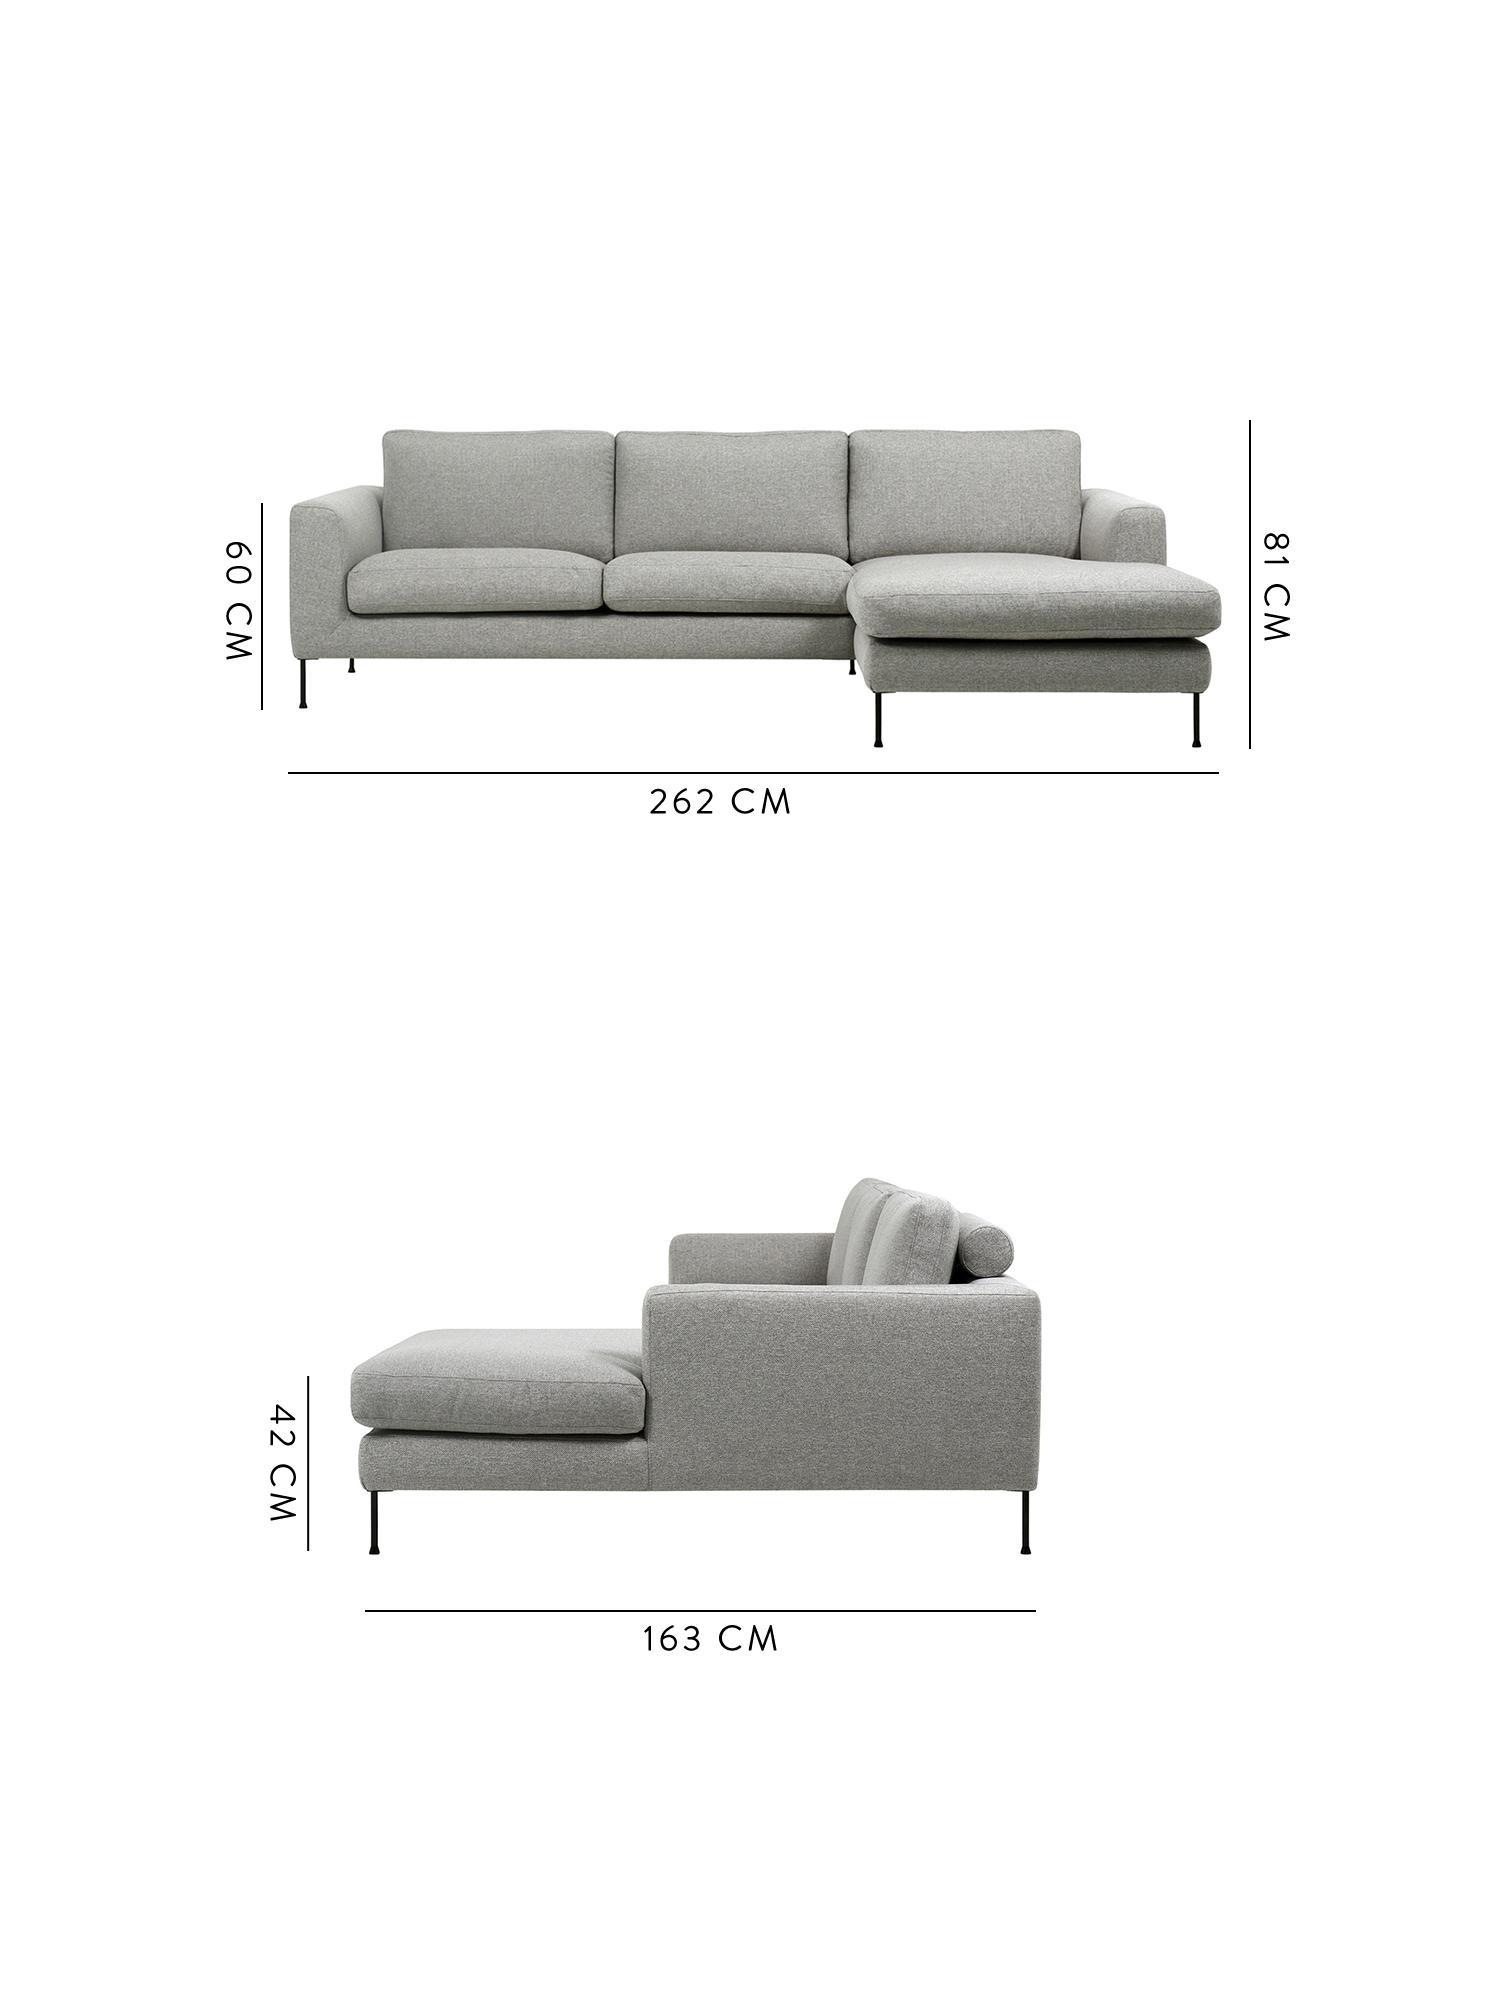 Canapé d'angle 3 places Cucita, Tissu gris clair